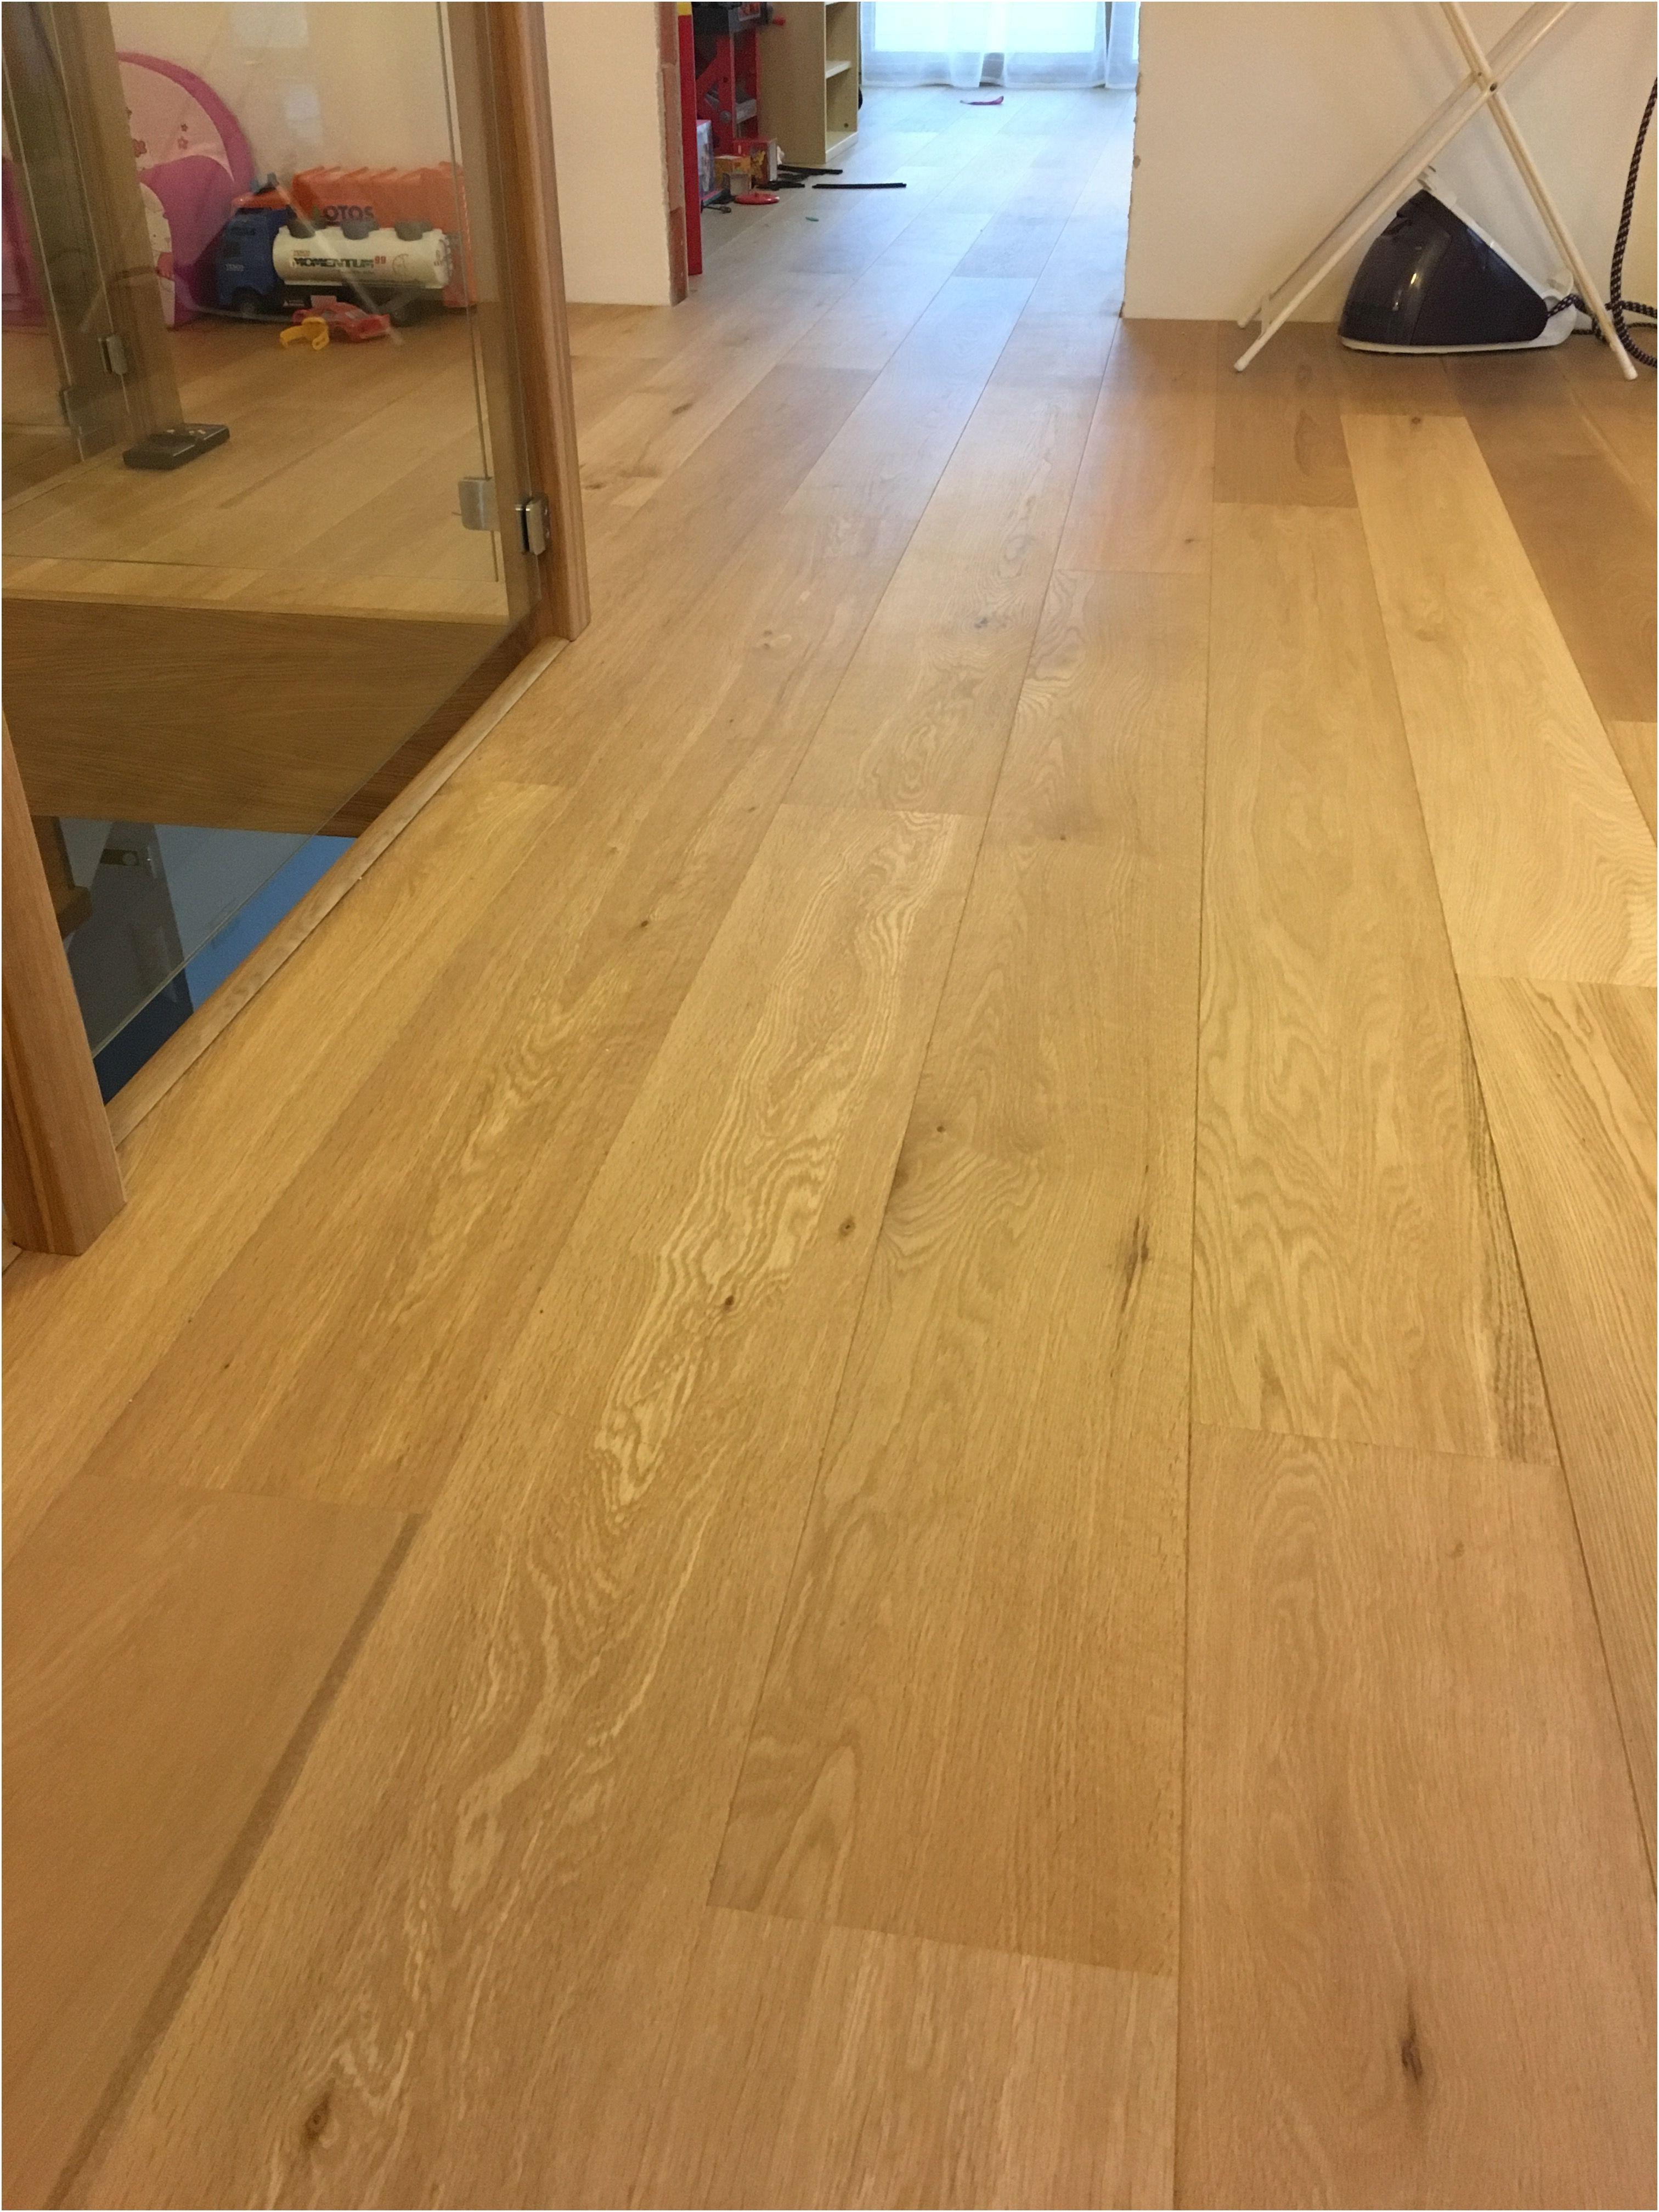 Easy Grip Strip Flooring Kitchen Trafficmaster Laminate Flooring Reviews Elegant Naturalny